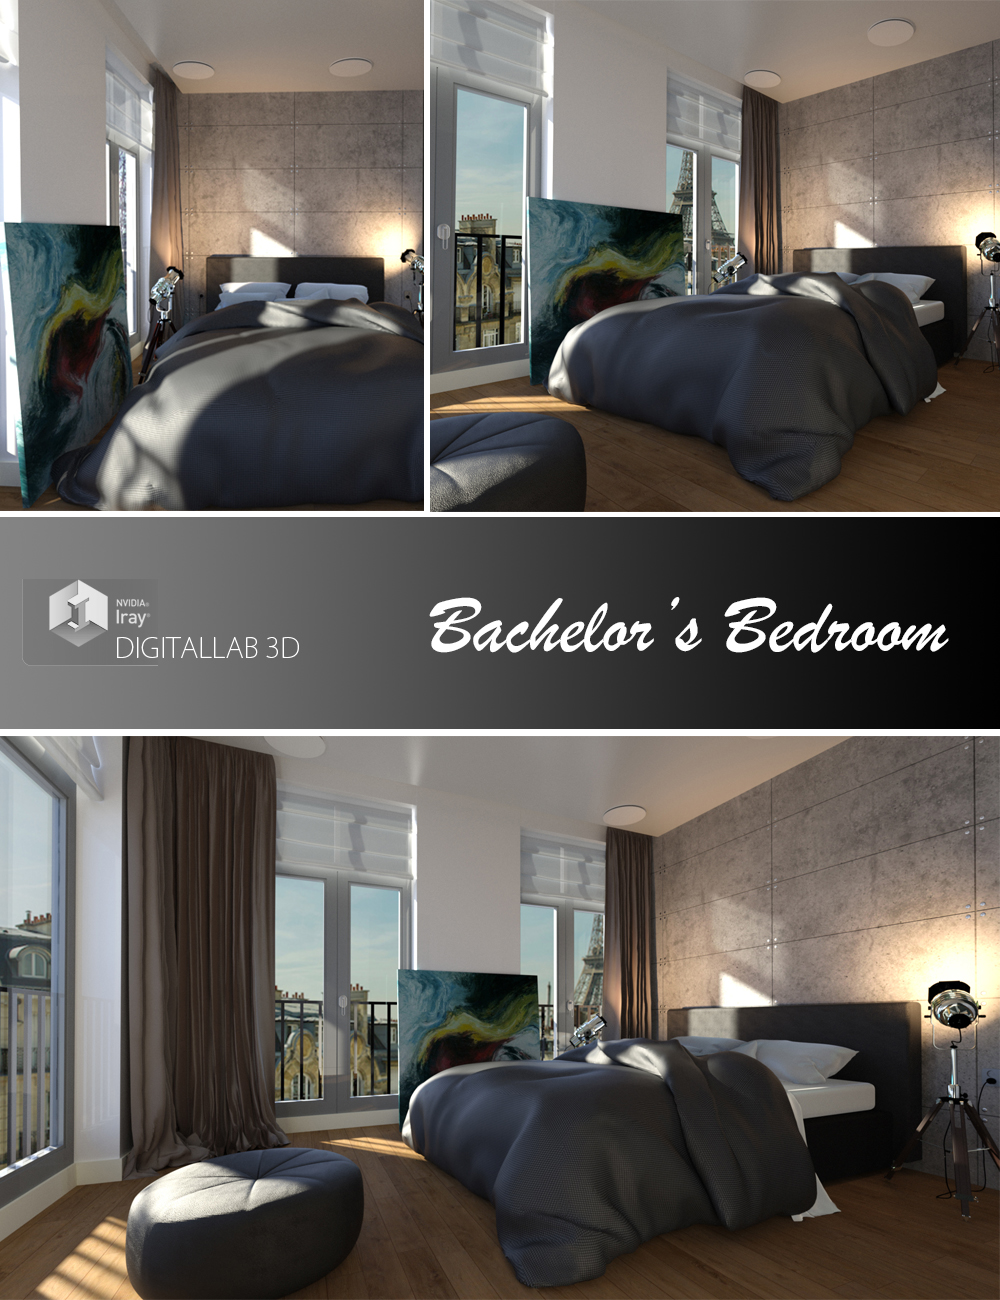 Bachelor's Bedroom by: Digitallab3D, 3D Models by Daz 3D